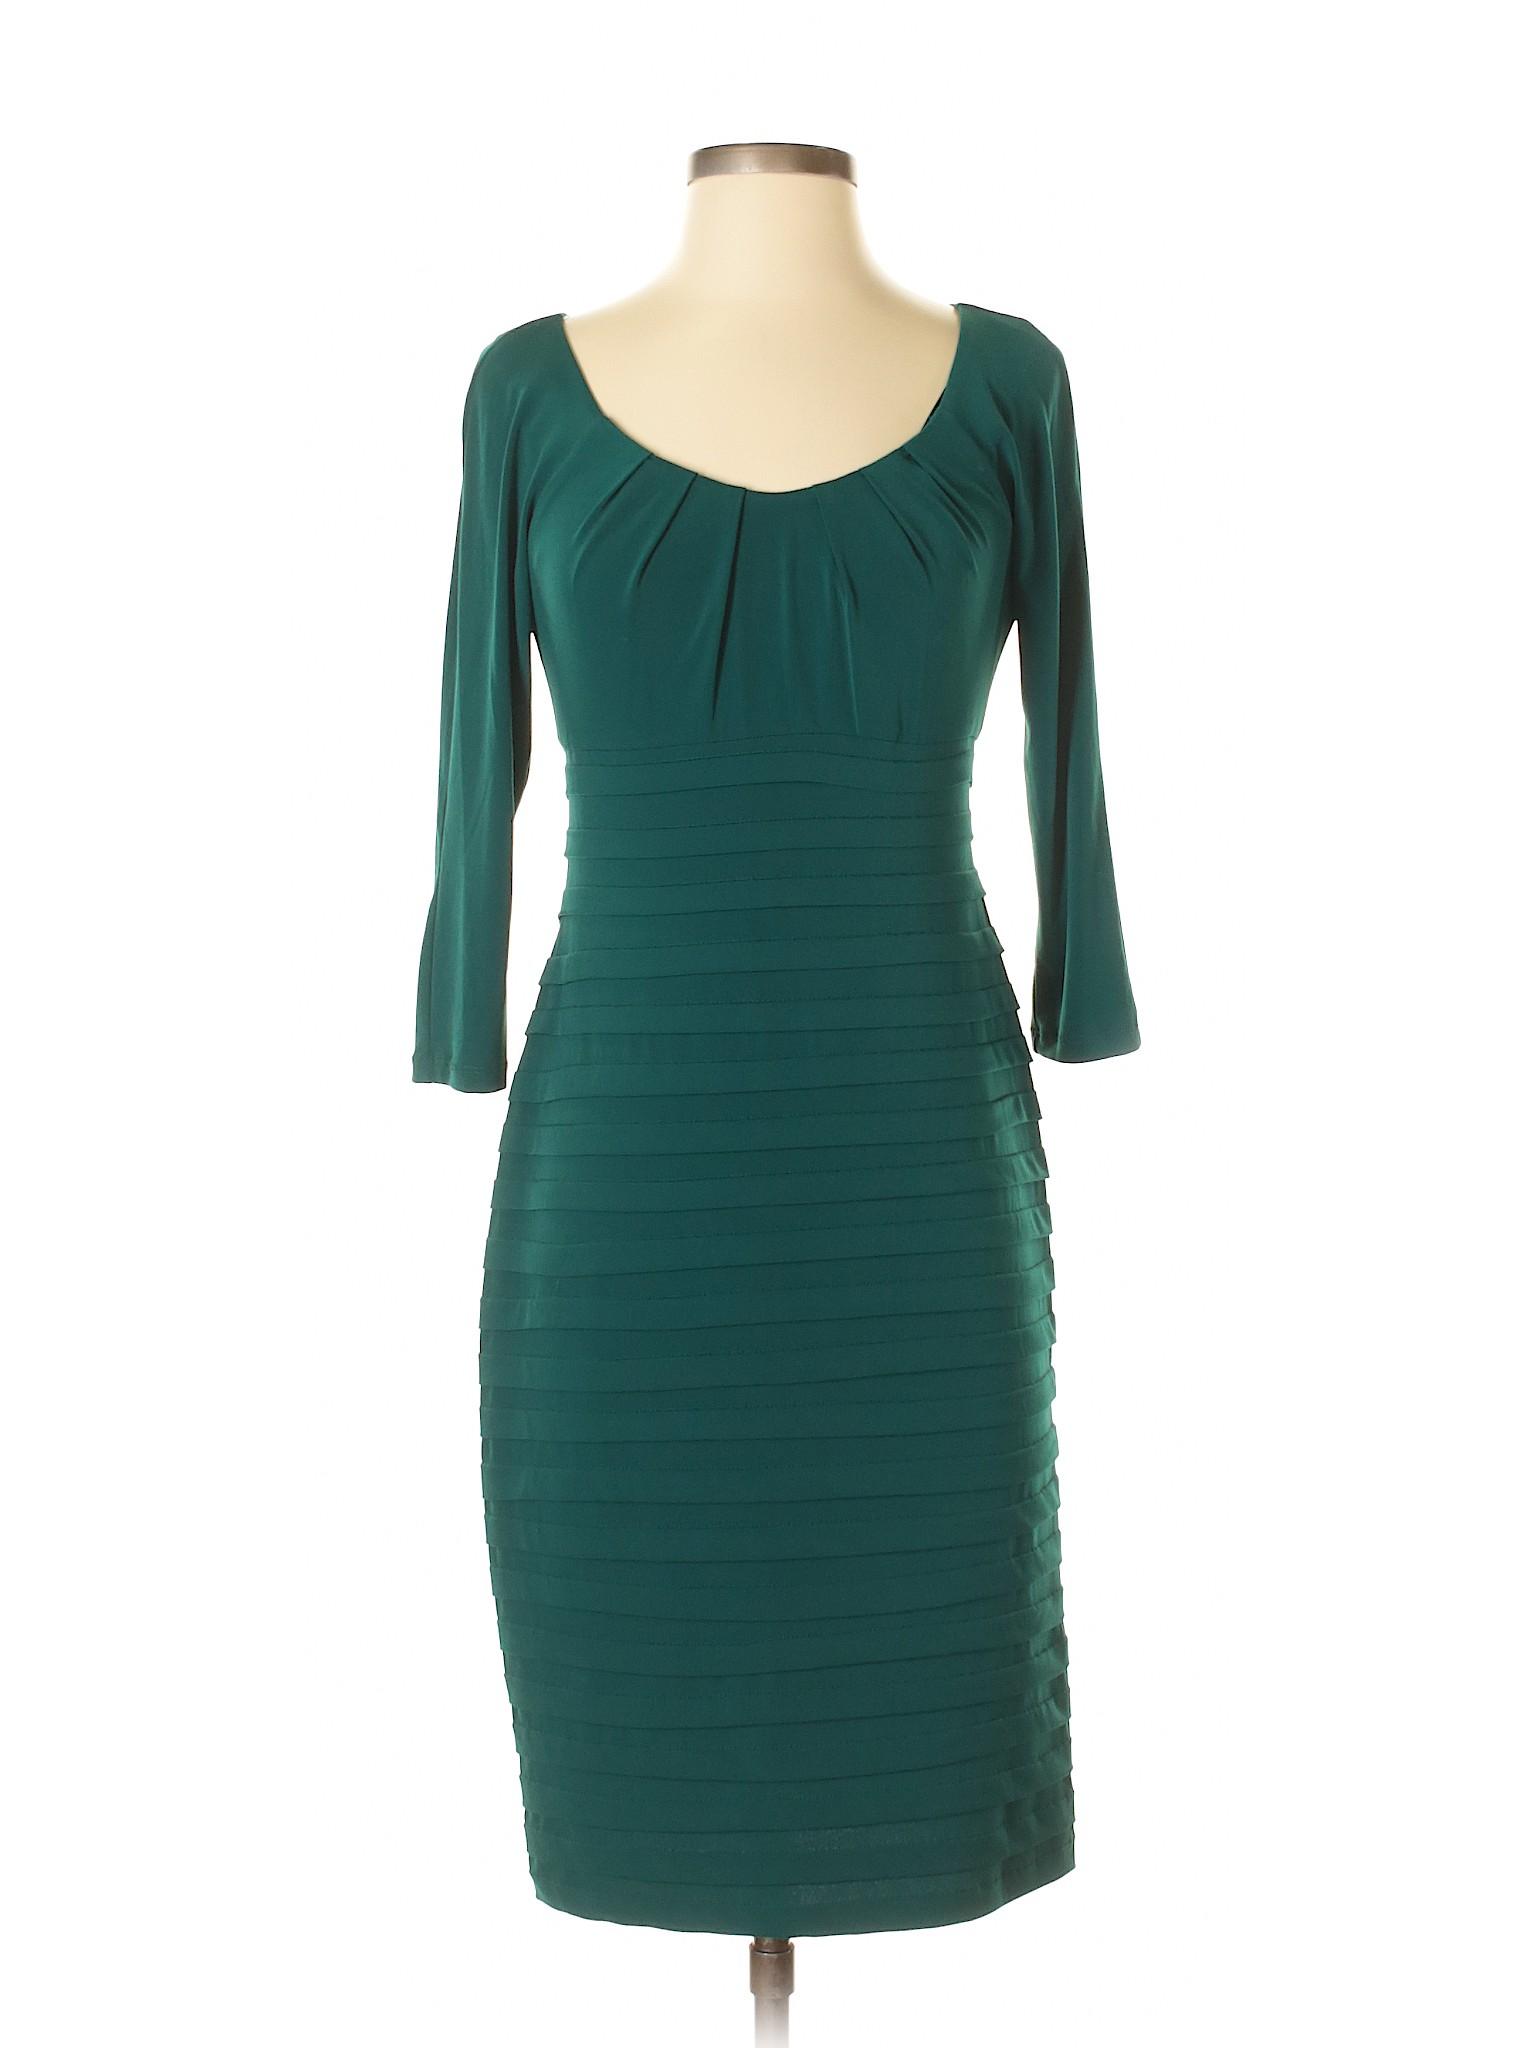 London Boutique Dress Times Casual winter YBxwxH6qp